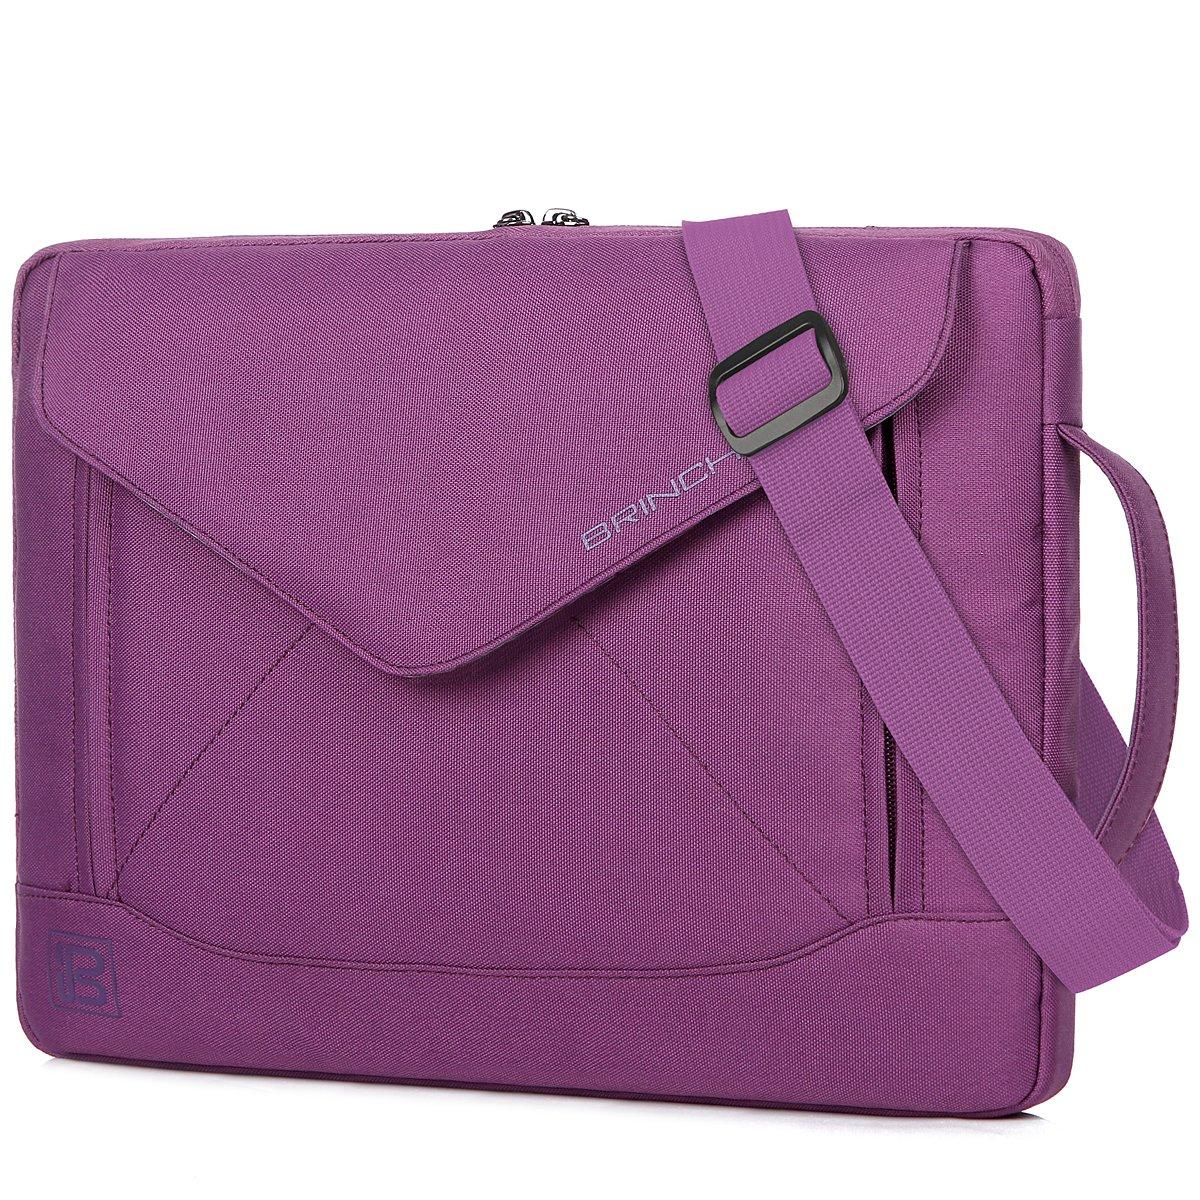 BRINCH Durable Envelope Nylon 15-15.6 Inch Laptop/Notebook/Macbook/Ultrabook/Tablet Computer Bag Shoulder Carrying Envelope Case Pouch Sleeve With Shoulder Strap Pockets and Card Slots (Purple)